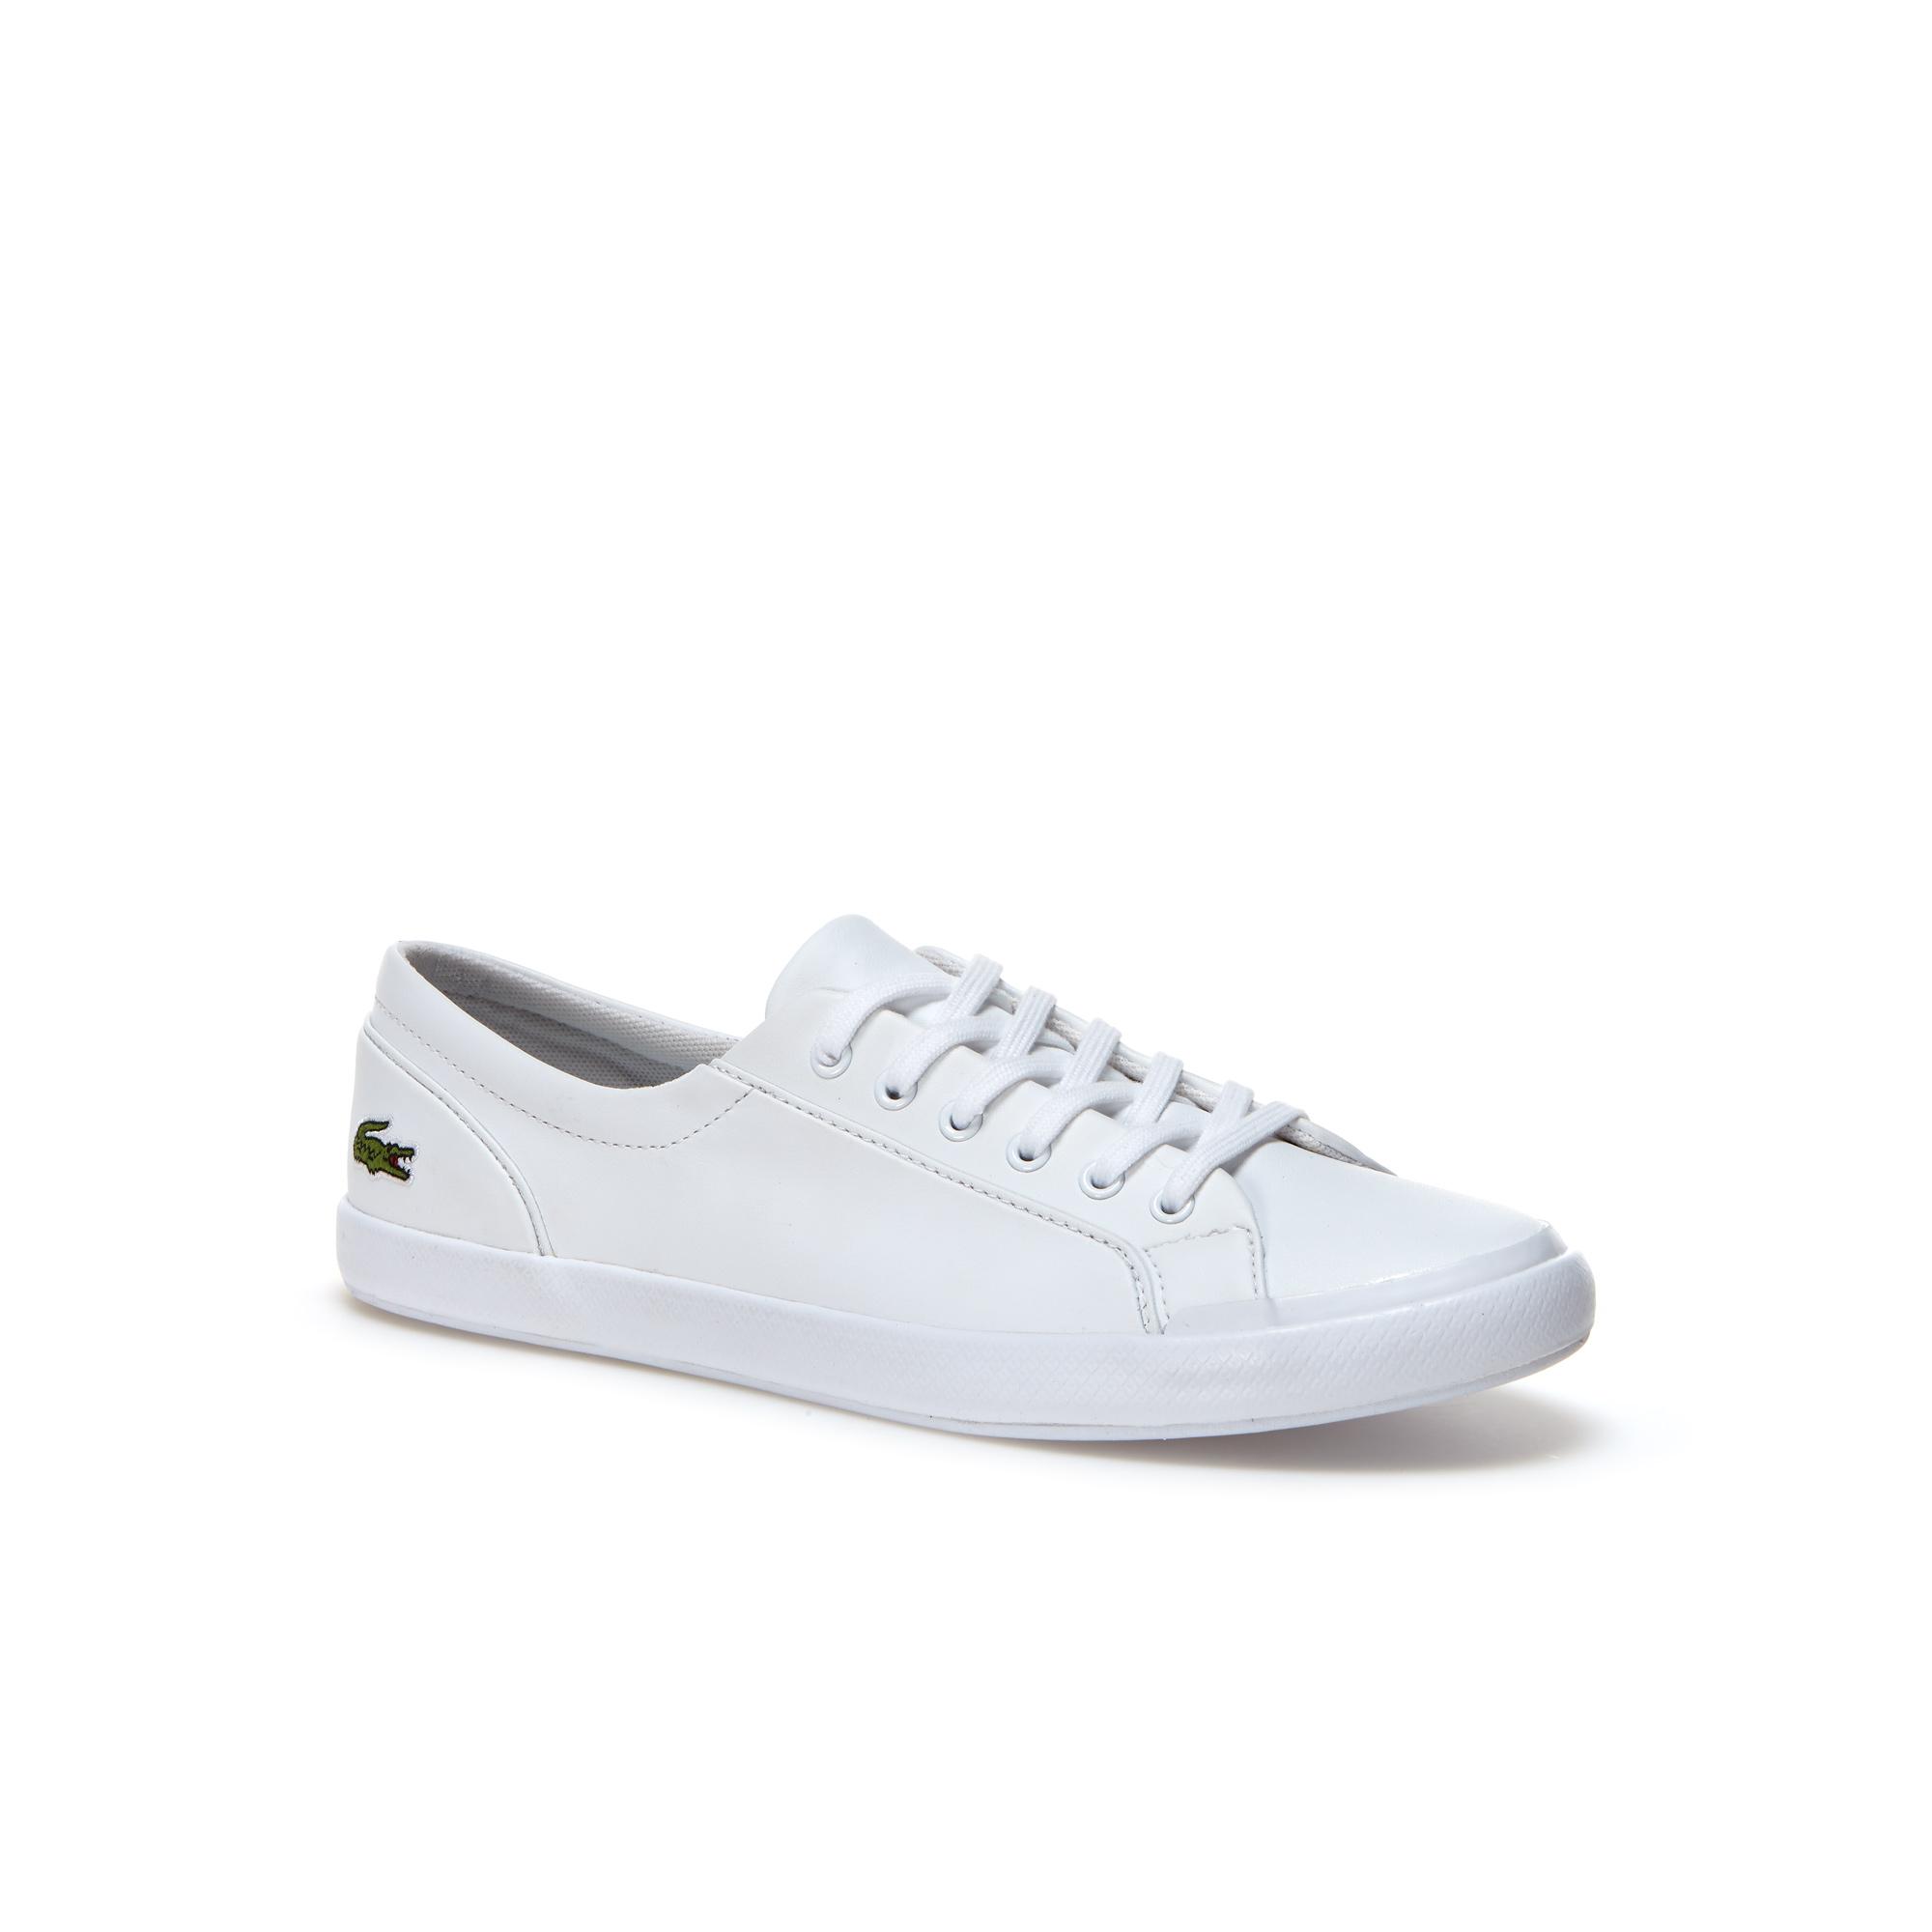 Buy Lacoste Sneakers Online | lazada.sg